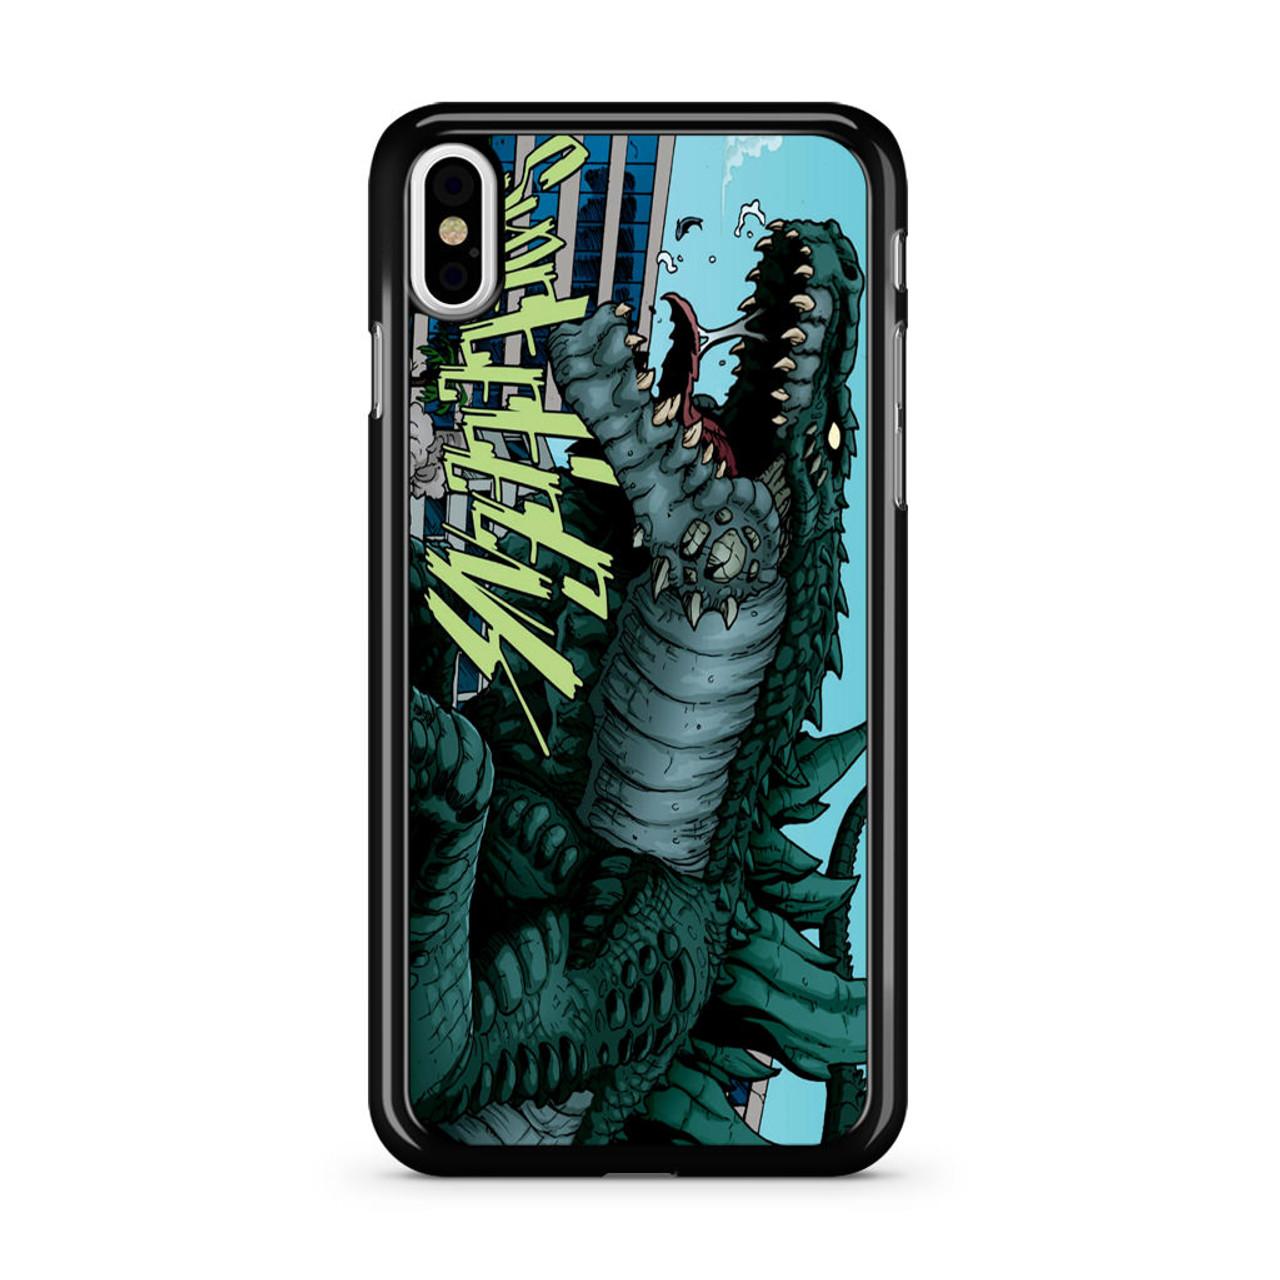 9acb9ec4fbf6 Zilla iPhone XS Max Case - GGIANS